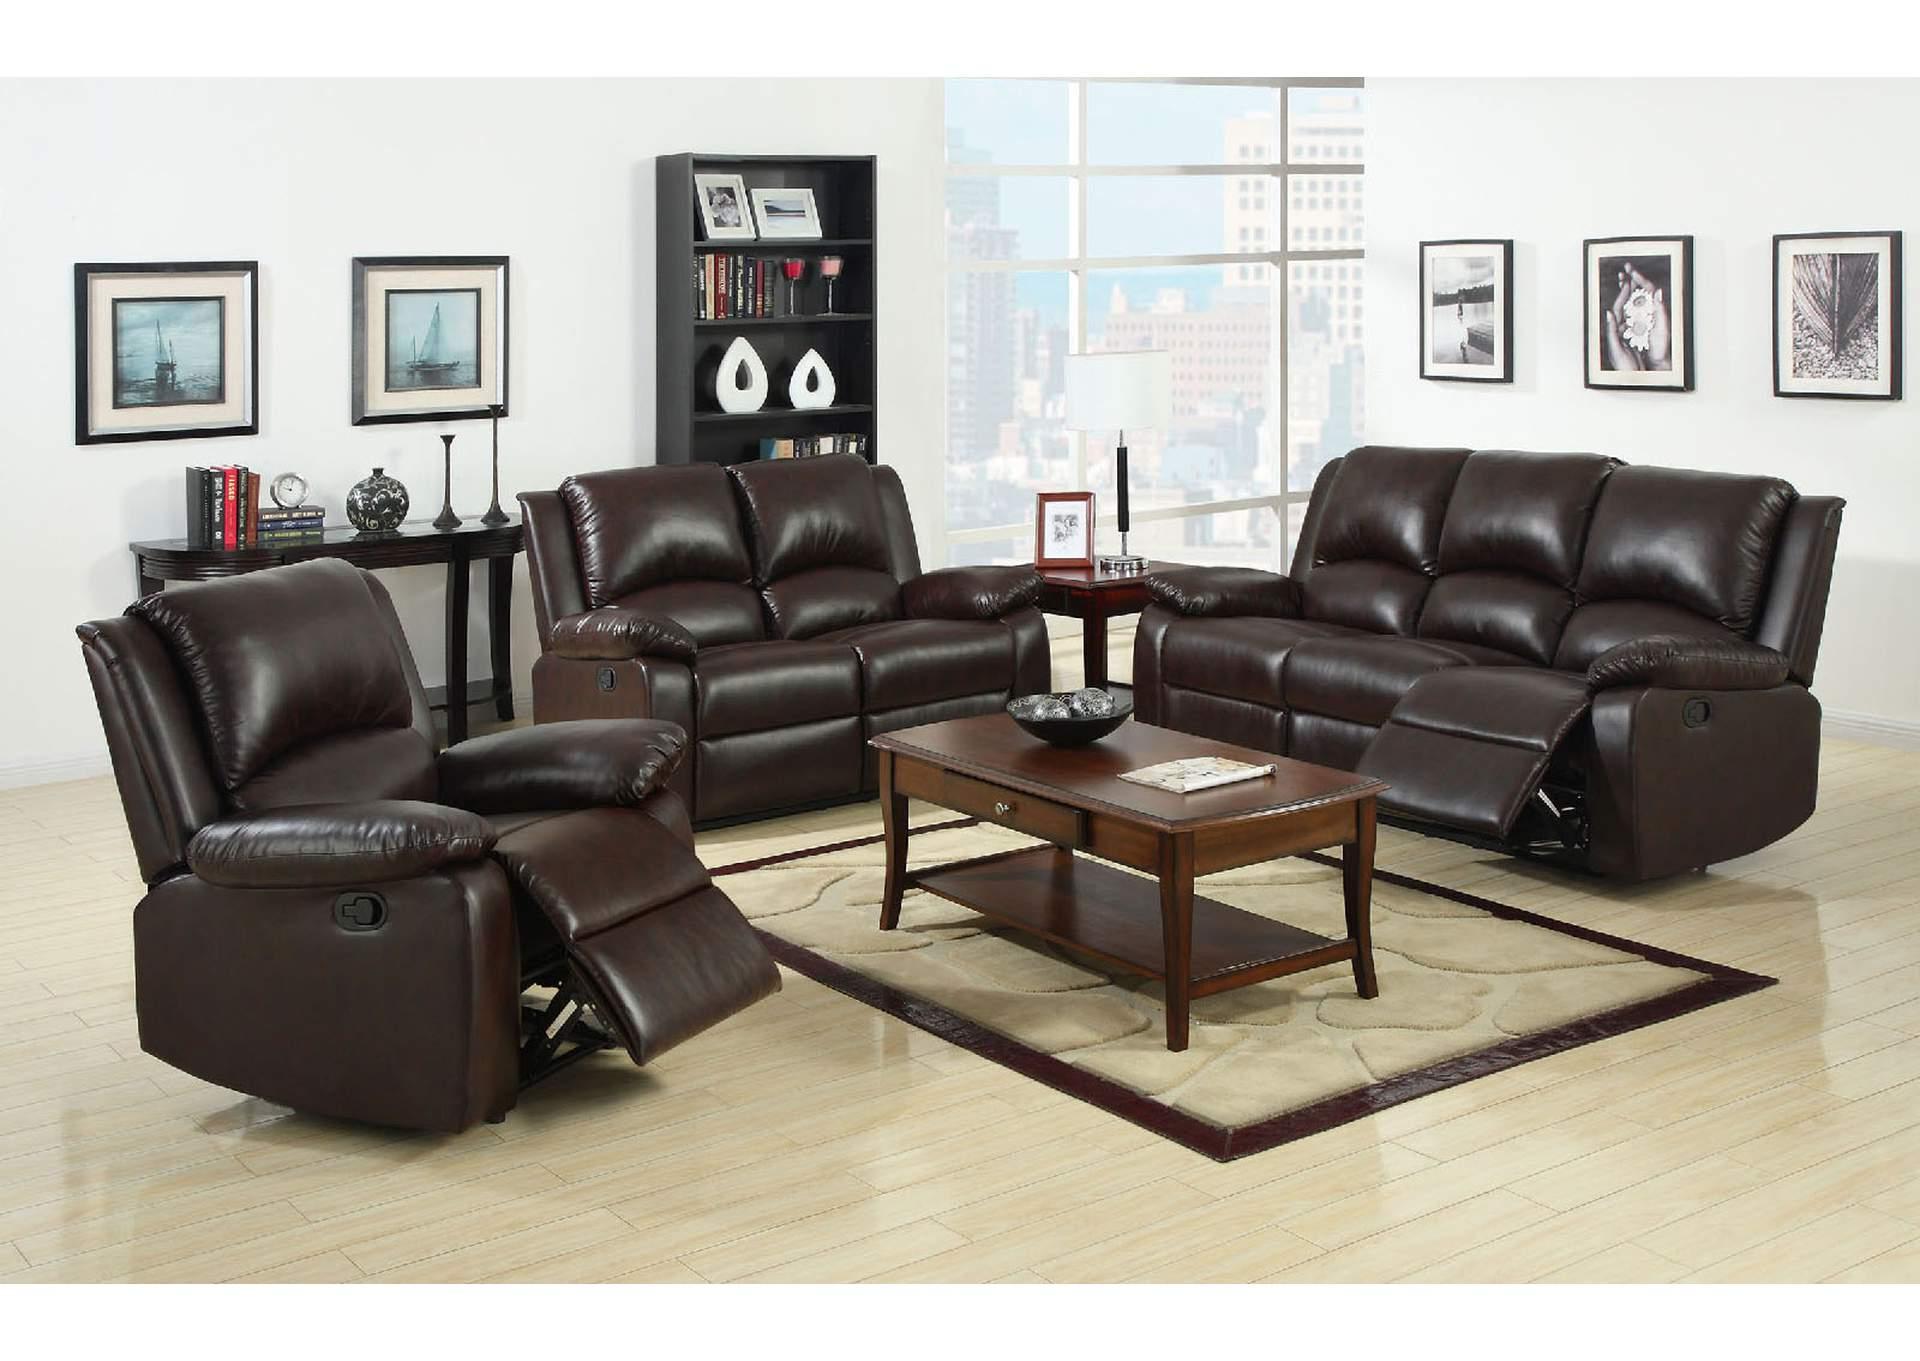 252873 Oxford Rustic Dark Brown Motion Sofa and Loveseat